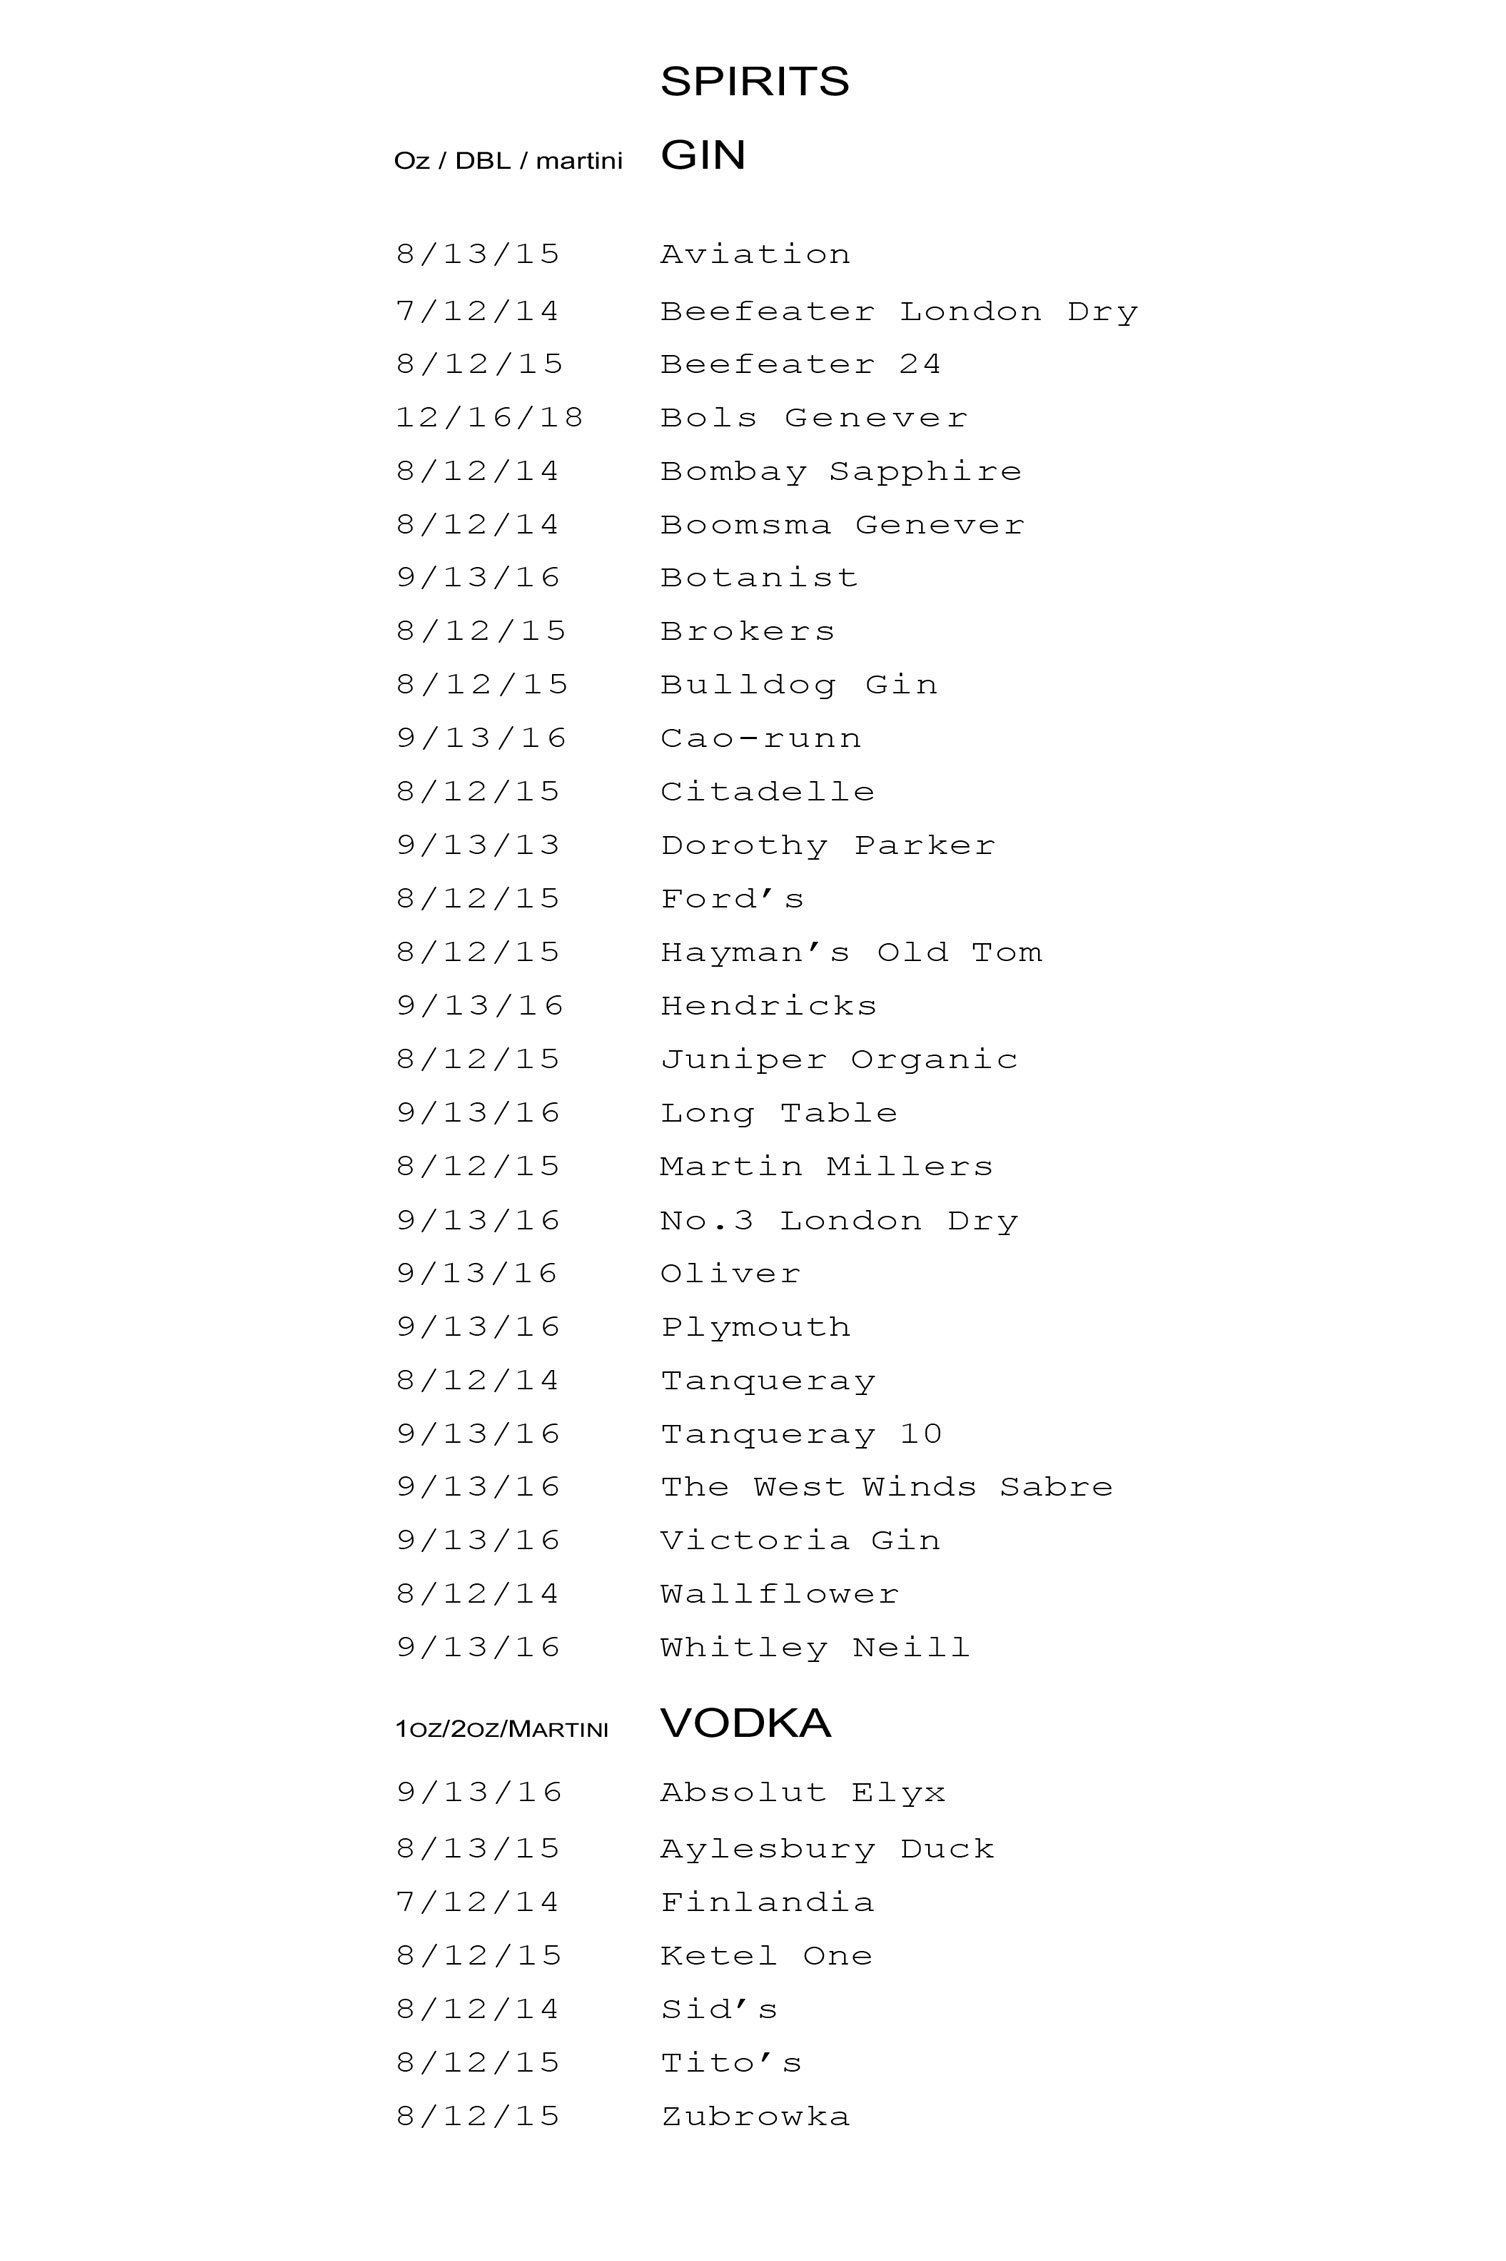 Spirits list